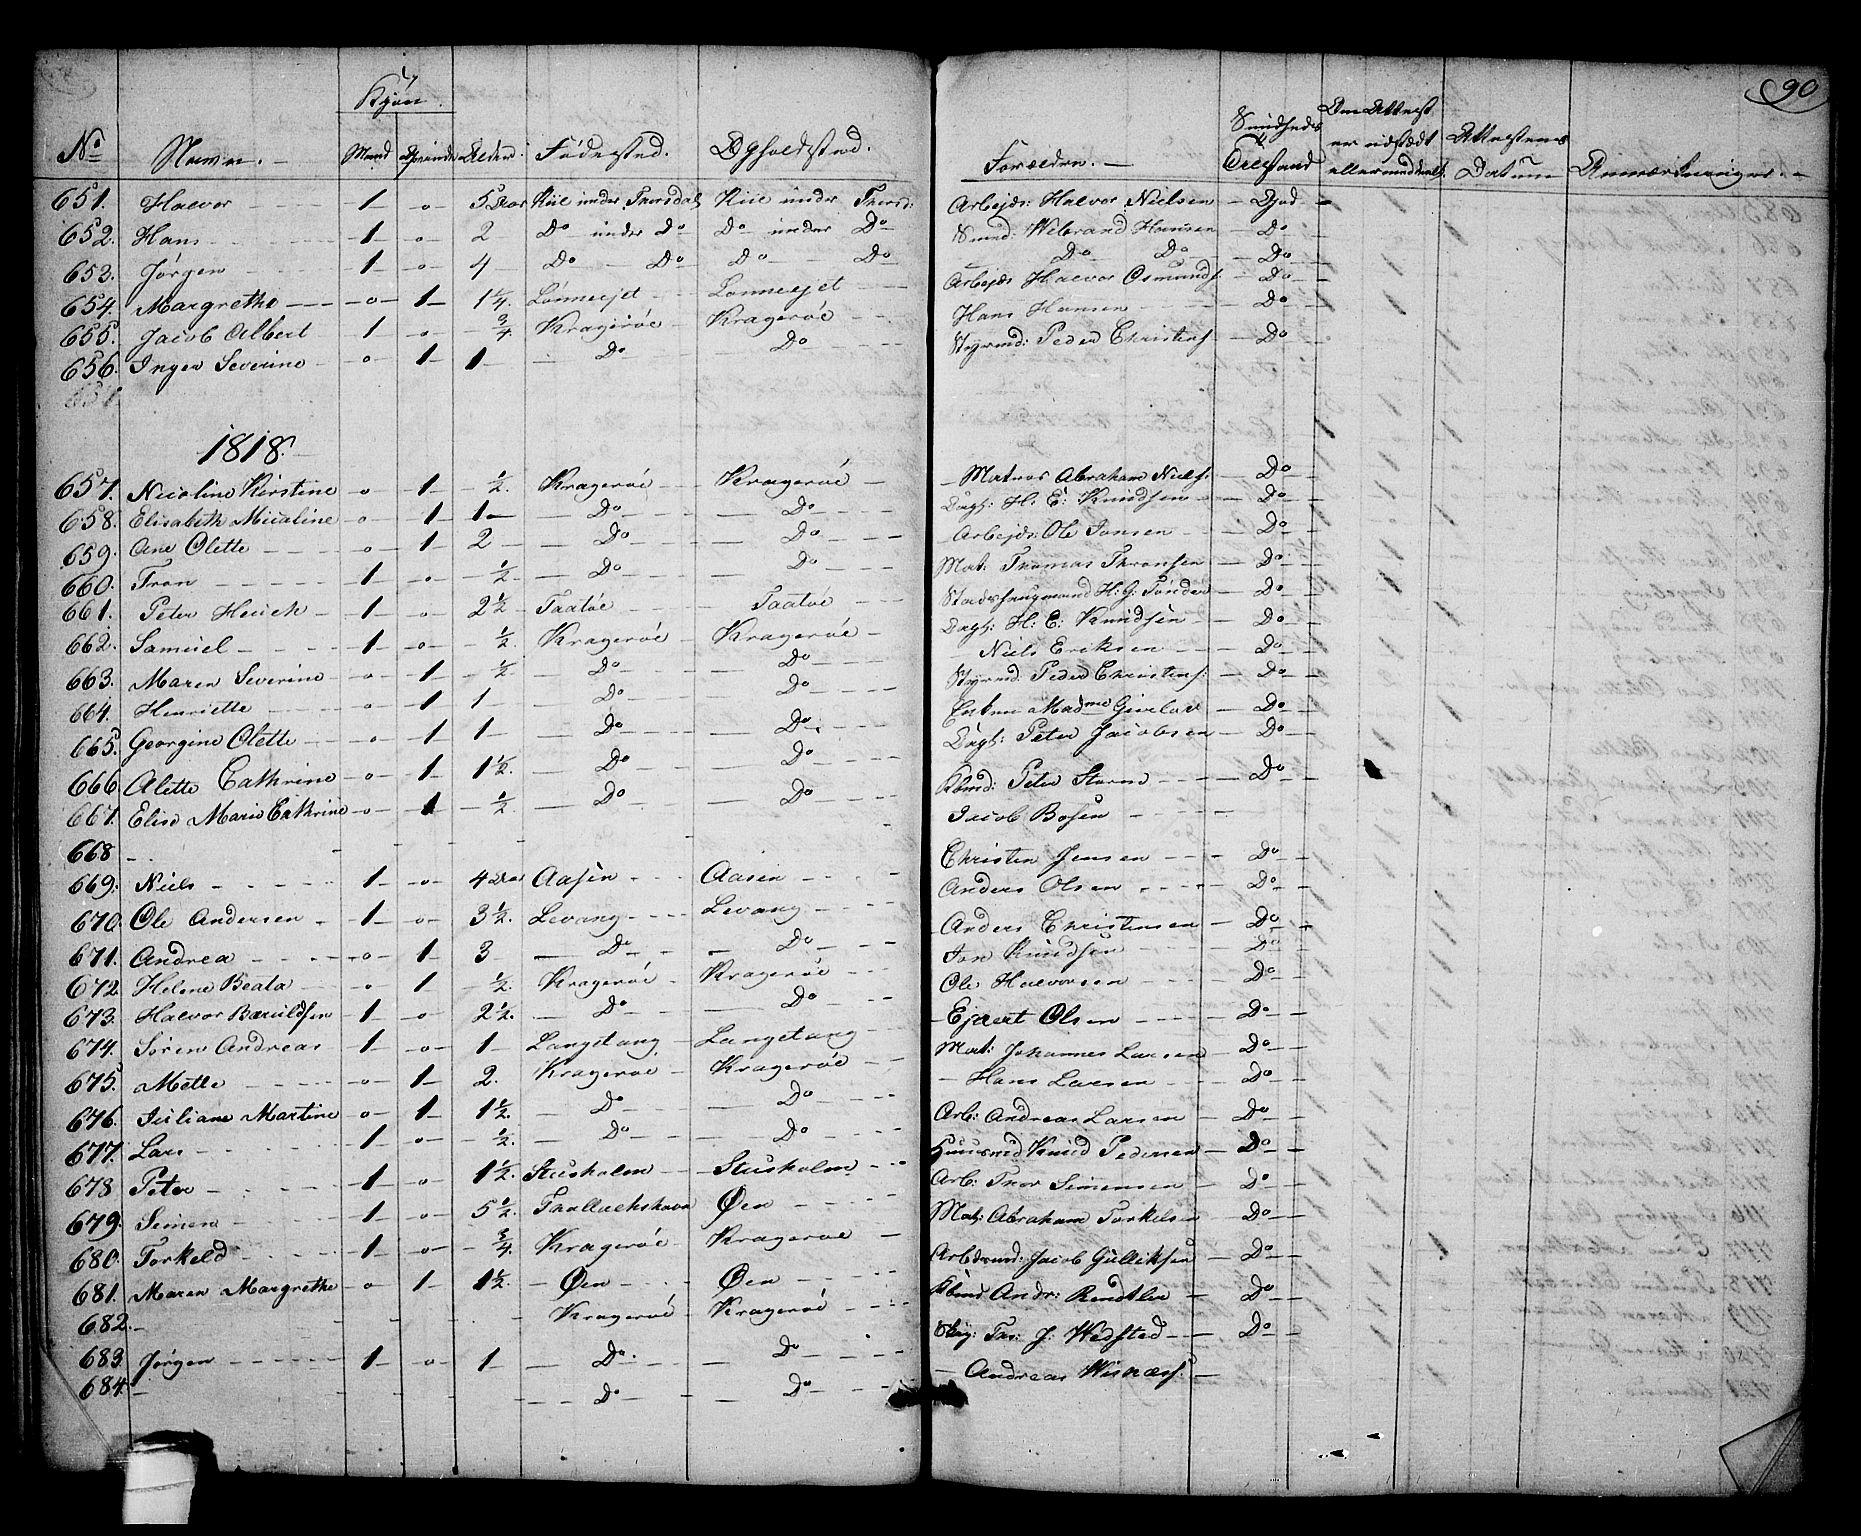 SAKO, Kragerø kirkebøker, F/Fa/L0003: Ministerialbok nr. 3, 1802-1813, s. 90